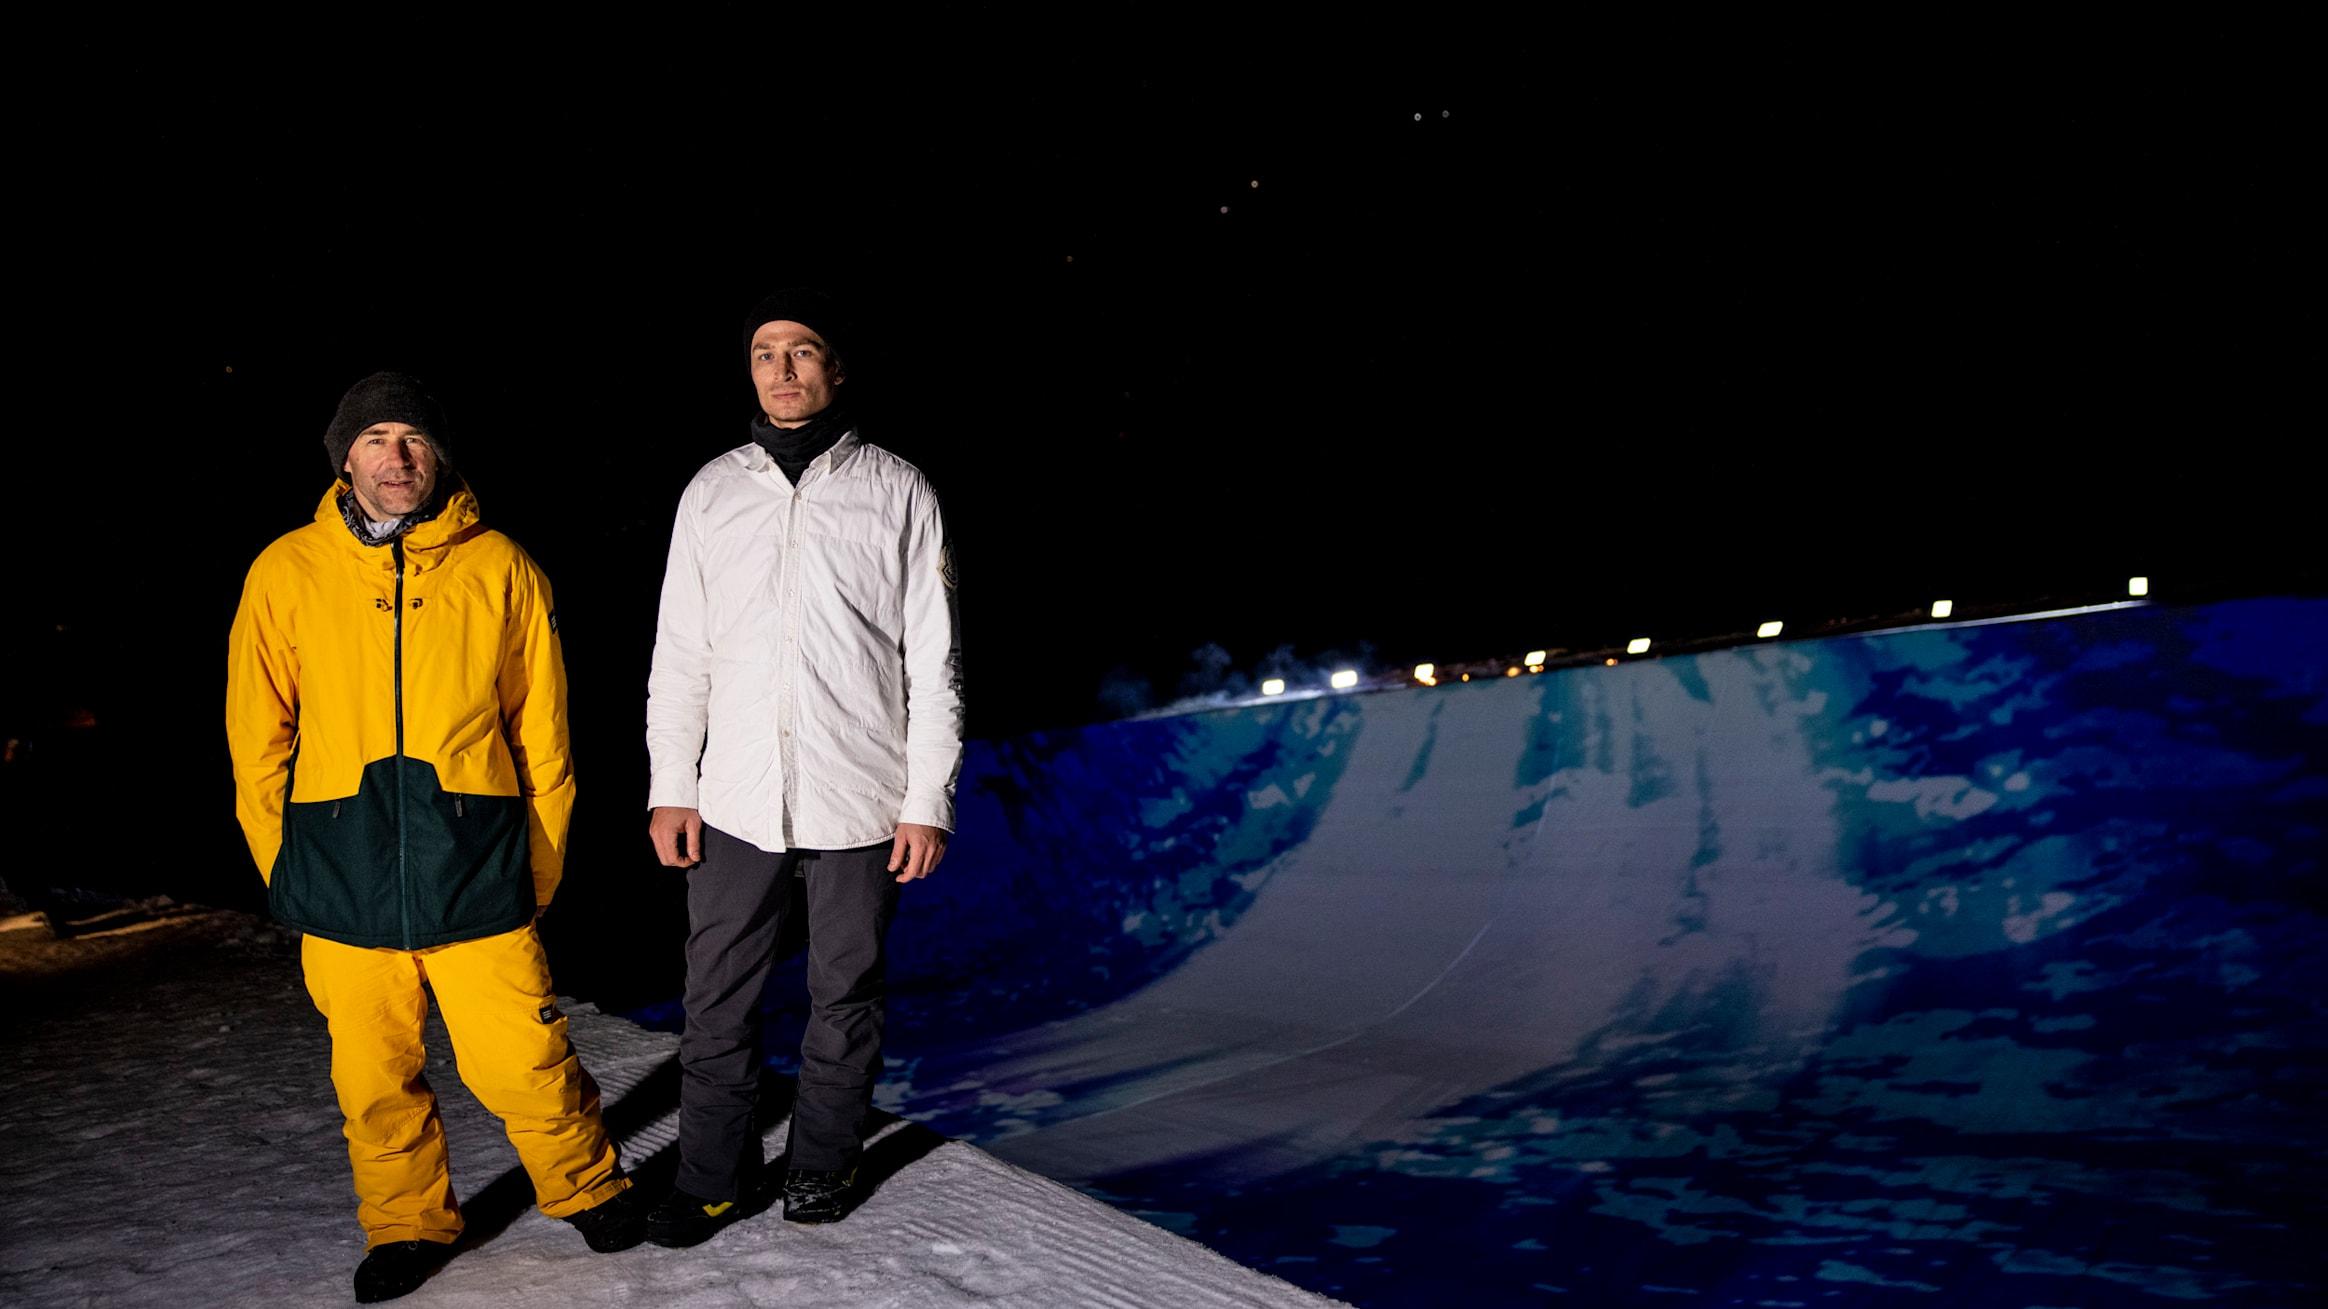 Gian Simmen links und Iouri Podladtchikov rechts